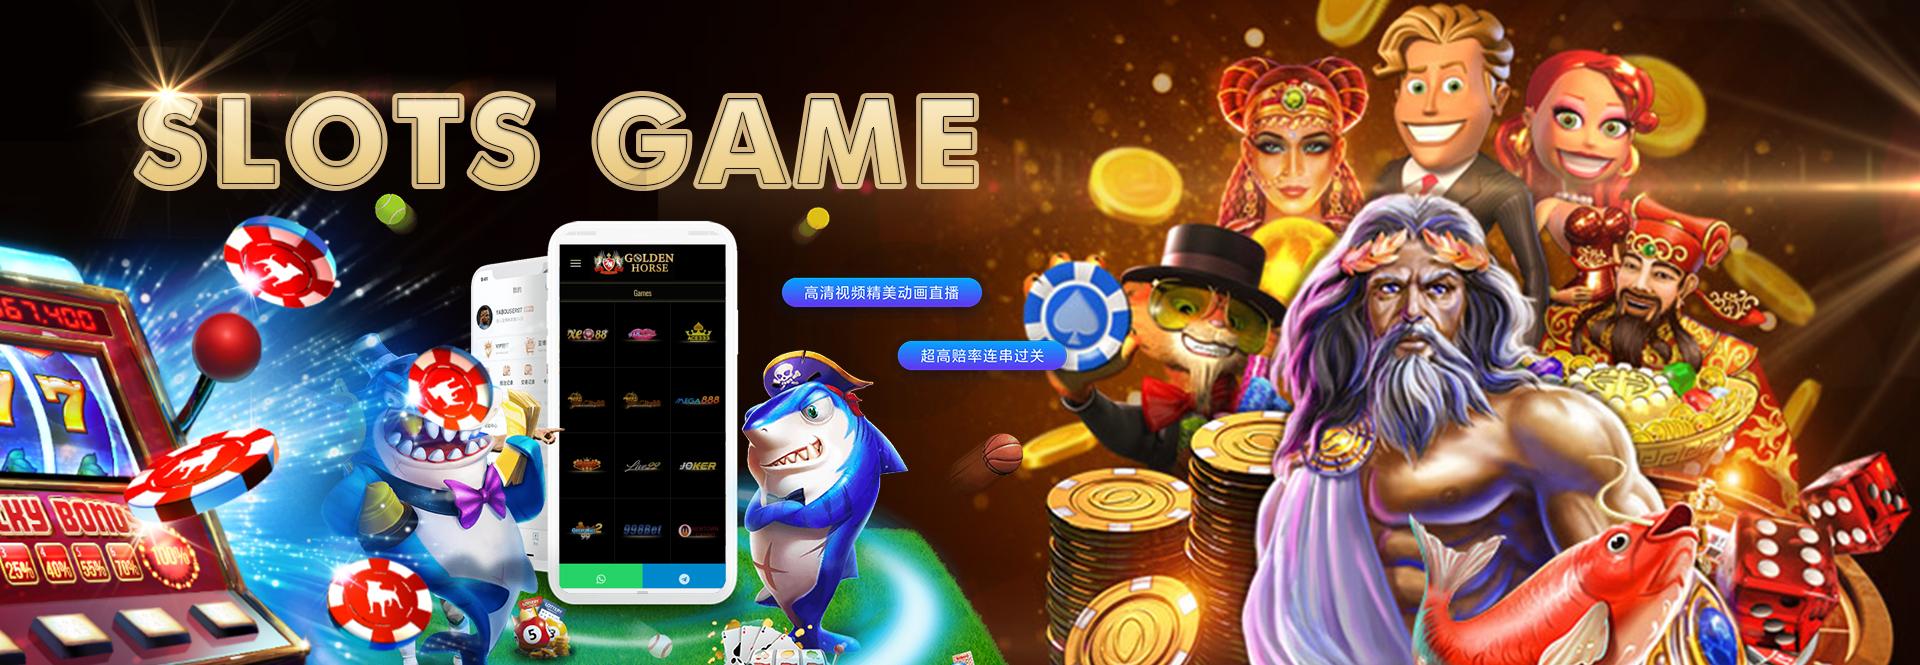 918kiss Mega888 Pussy888 Ace333 Joker Live22  Topup - Jackpot - Angpao - Online Slot Games